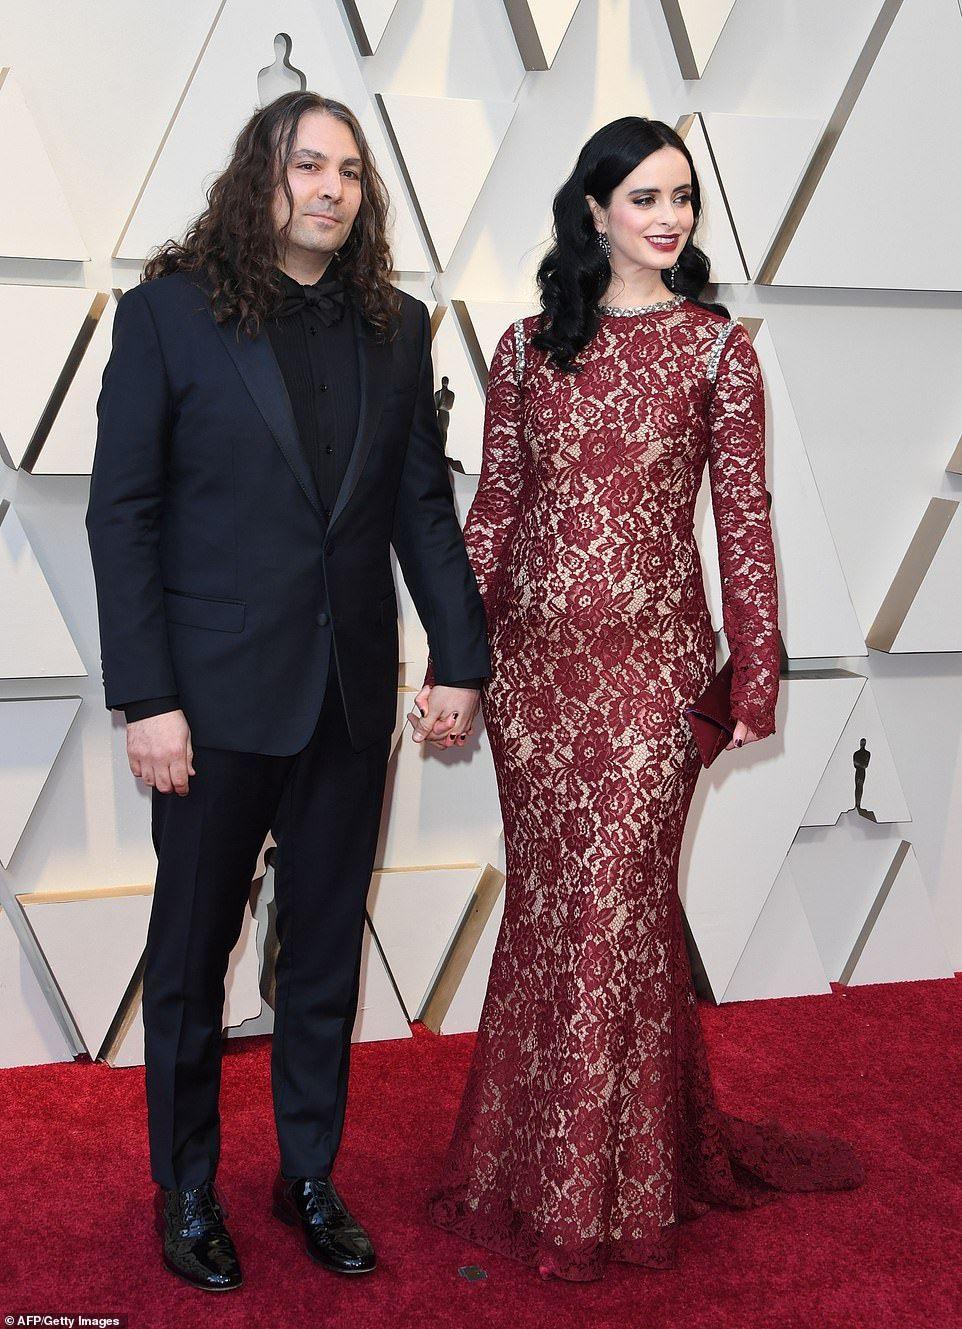 Oscars 2019: Best dressed stars arrive on red carpet at